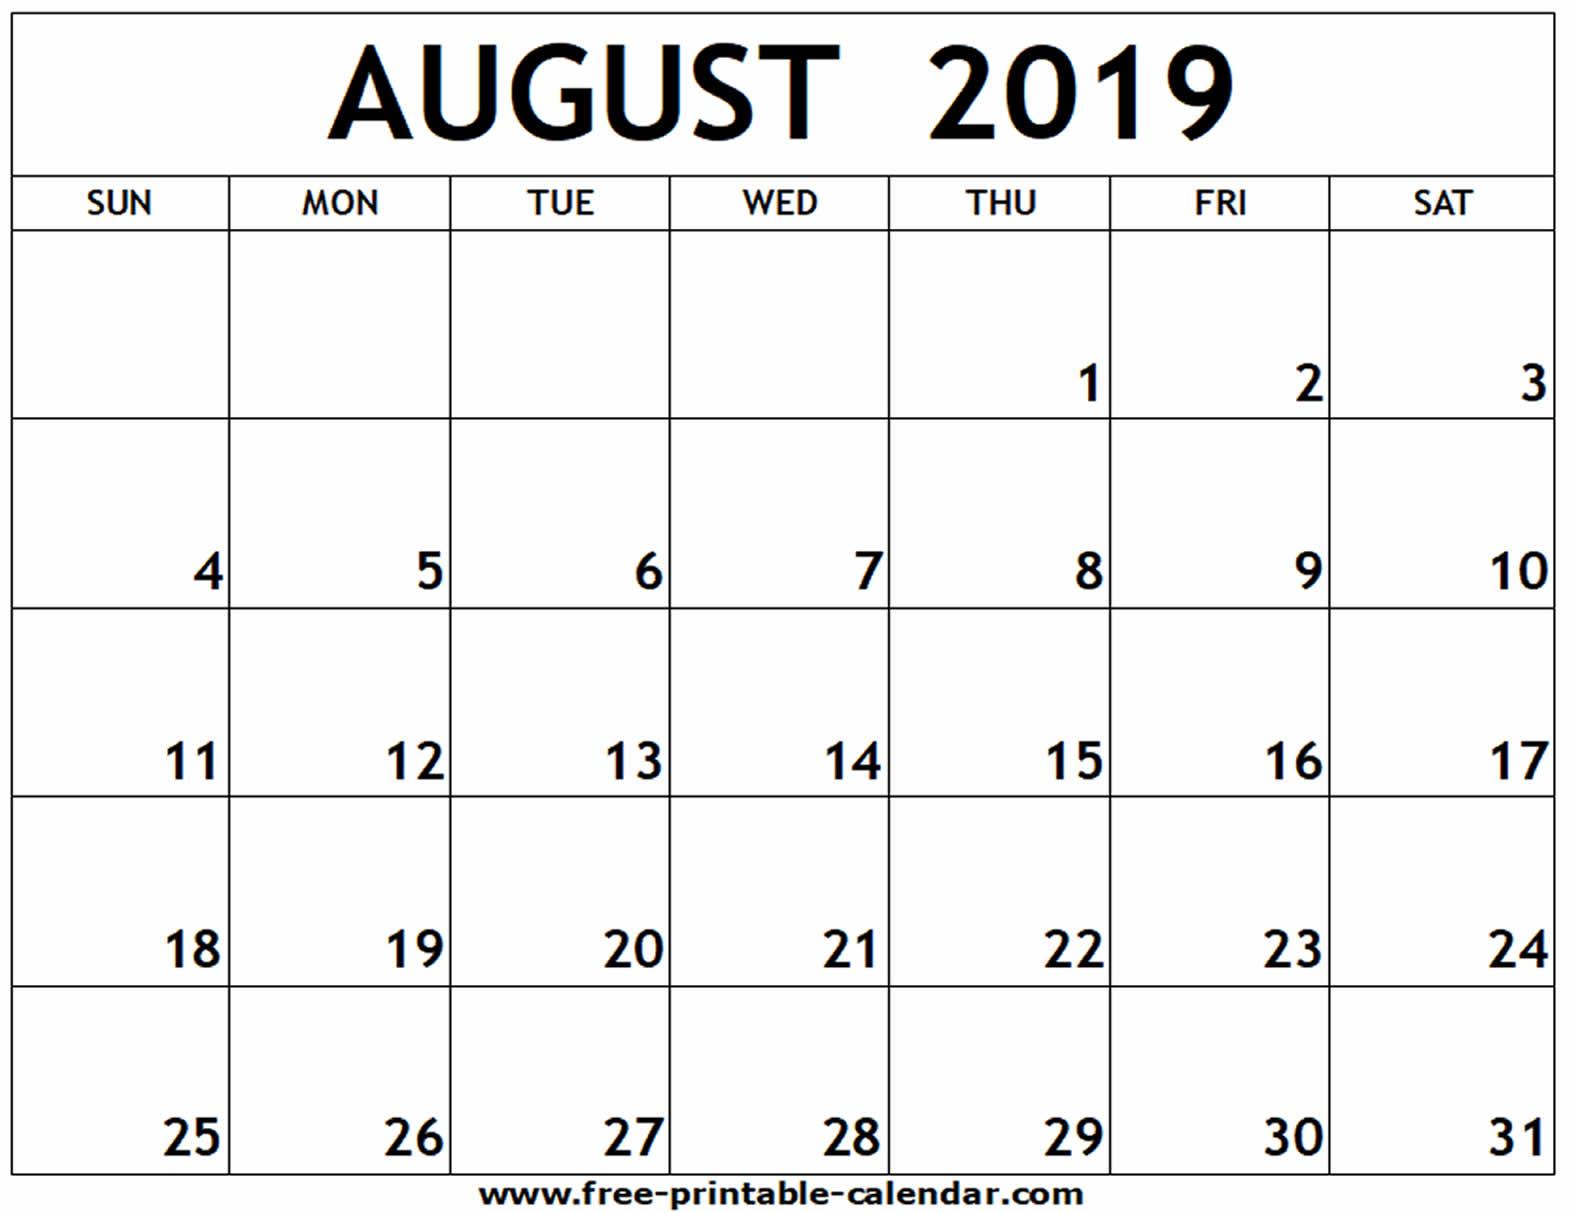 August 2019 Printable Calendar - Free-Printable-Calendar in Fill In Blank Calendar